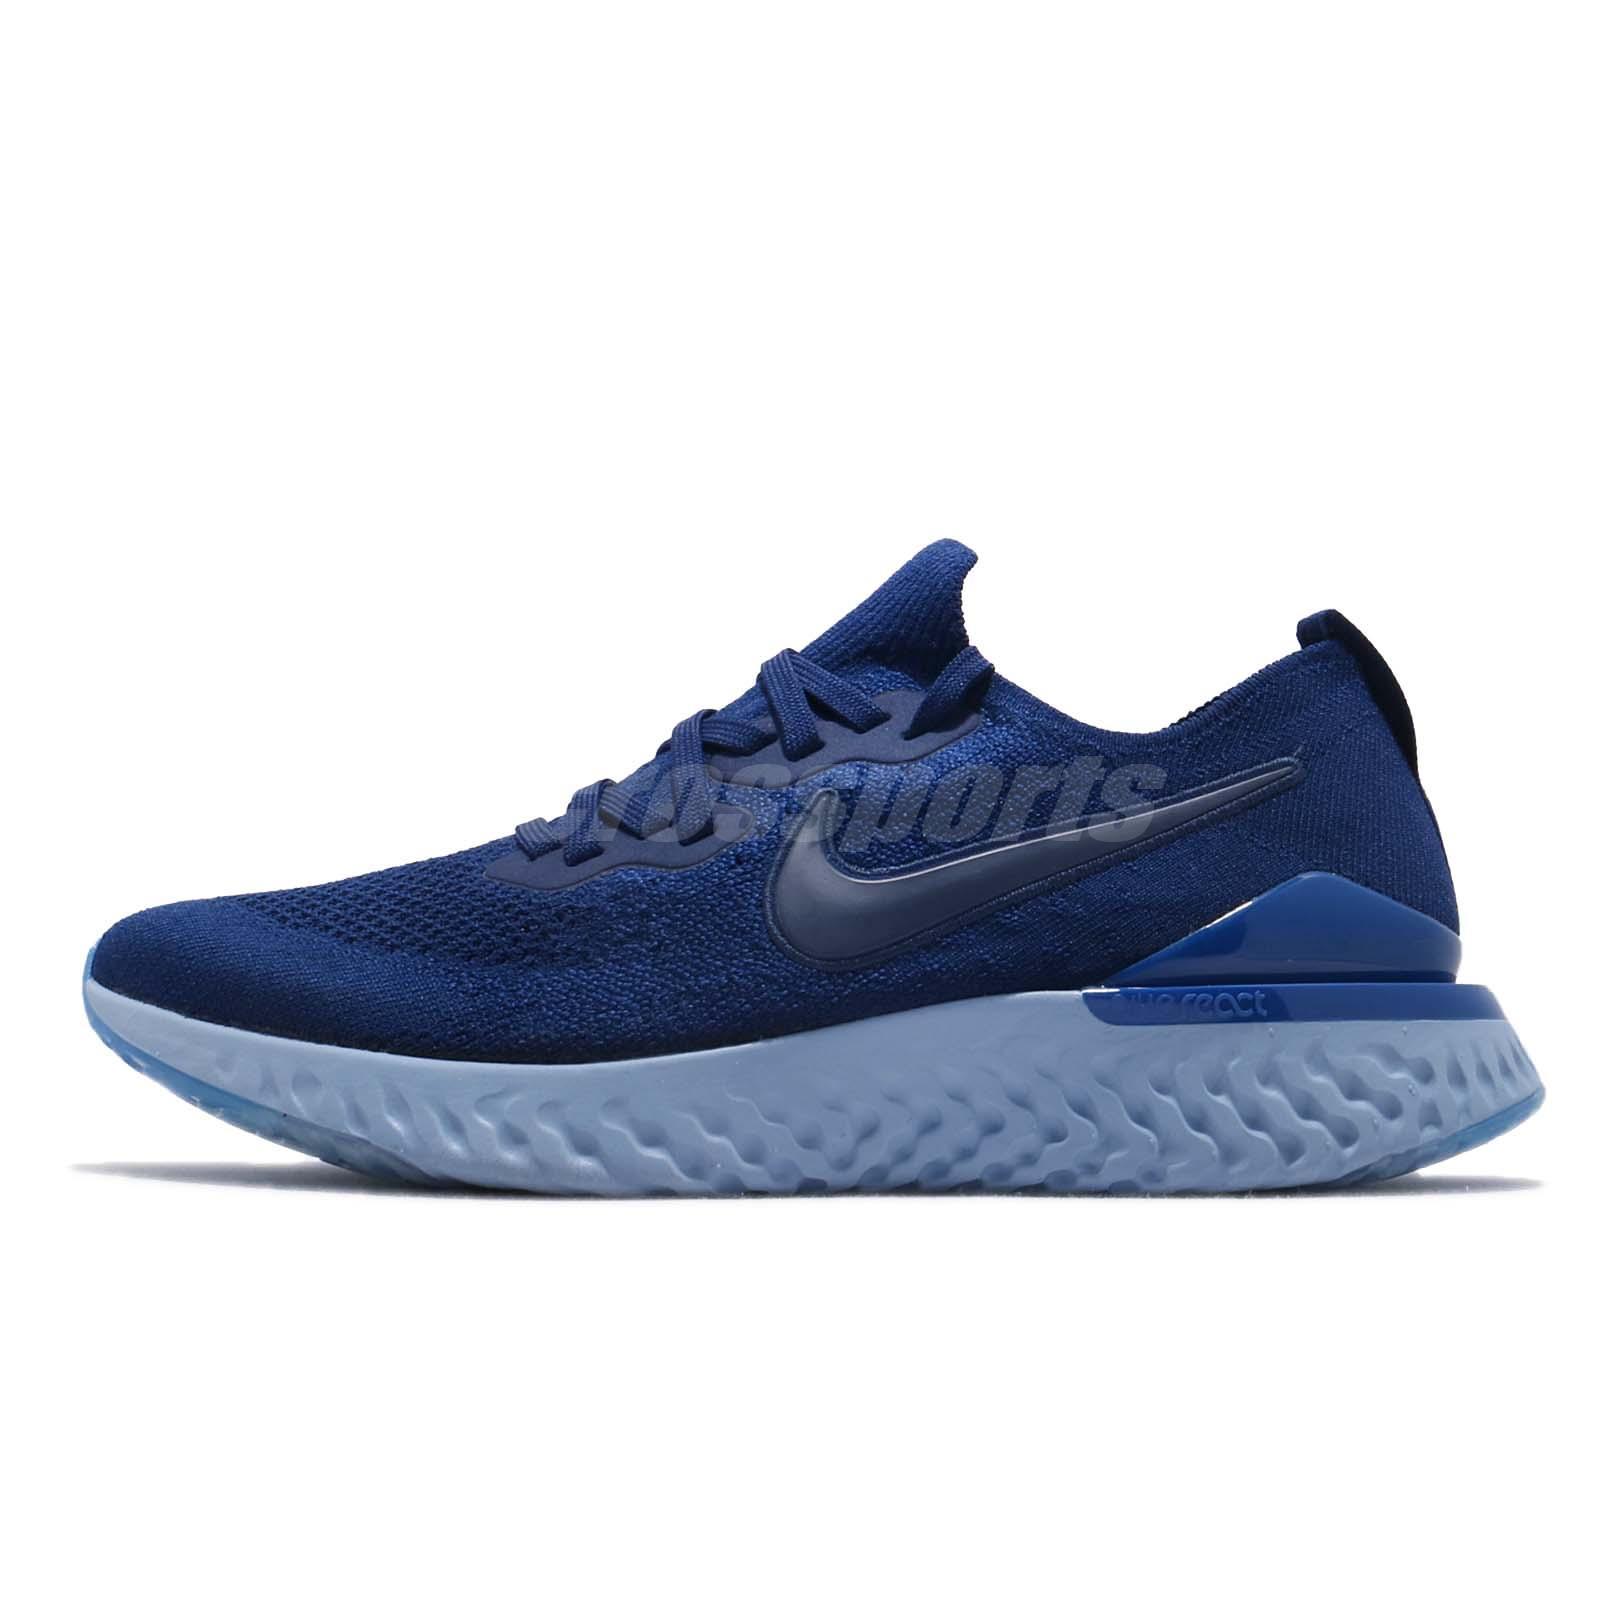 ea734cc43b3d10 Nike Epic React Flyknit 2 II Blue Void Men Running Shoes Sneakers BQ8928-400